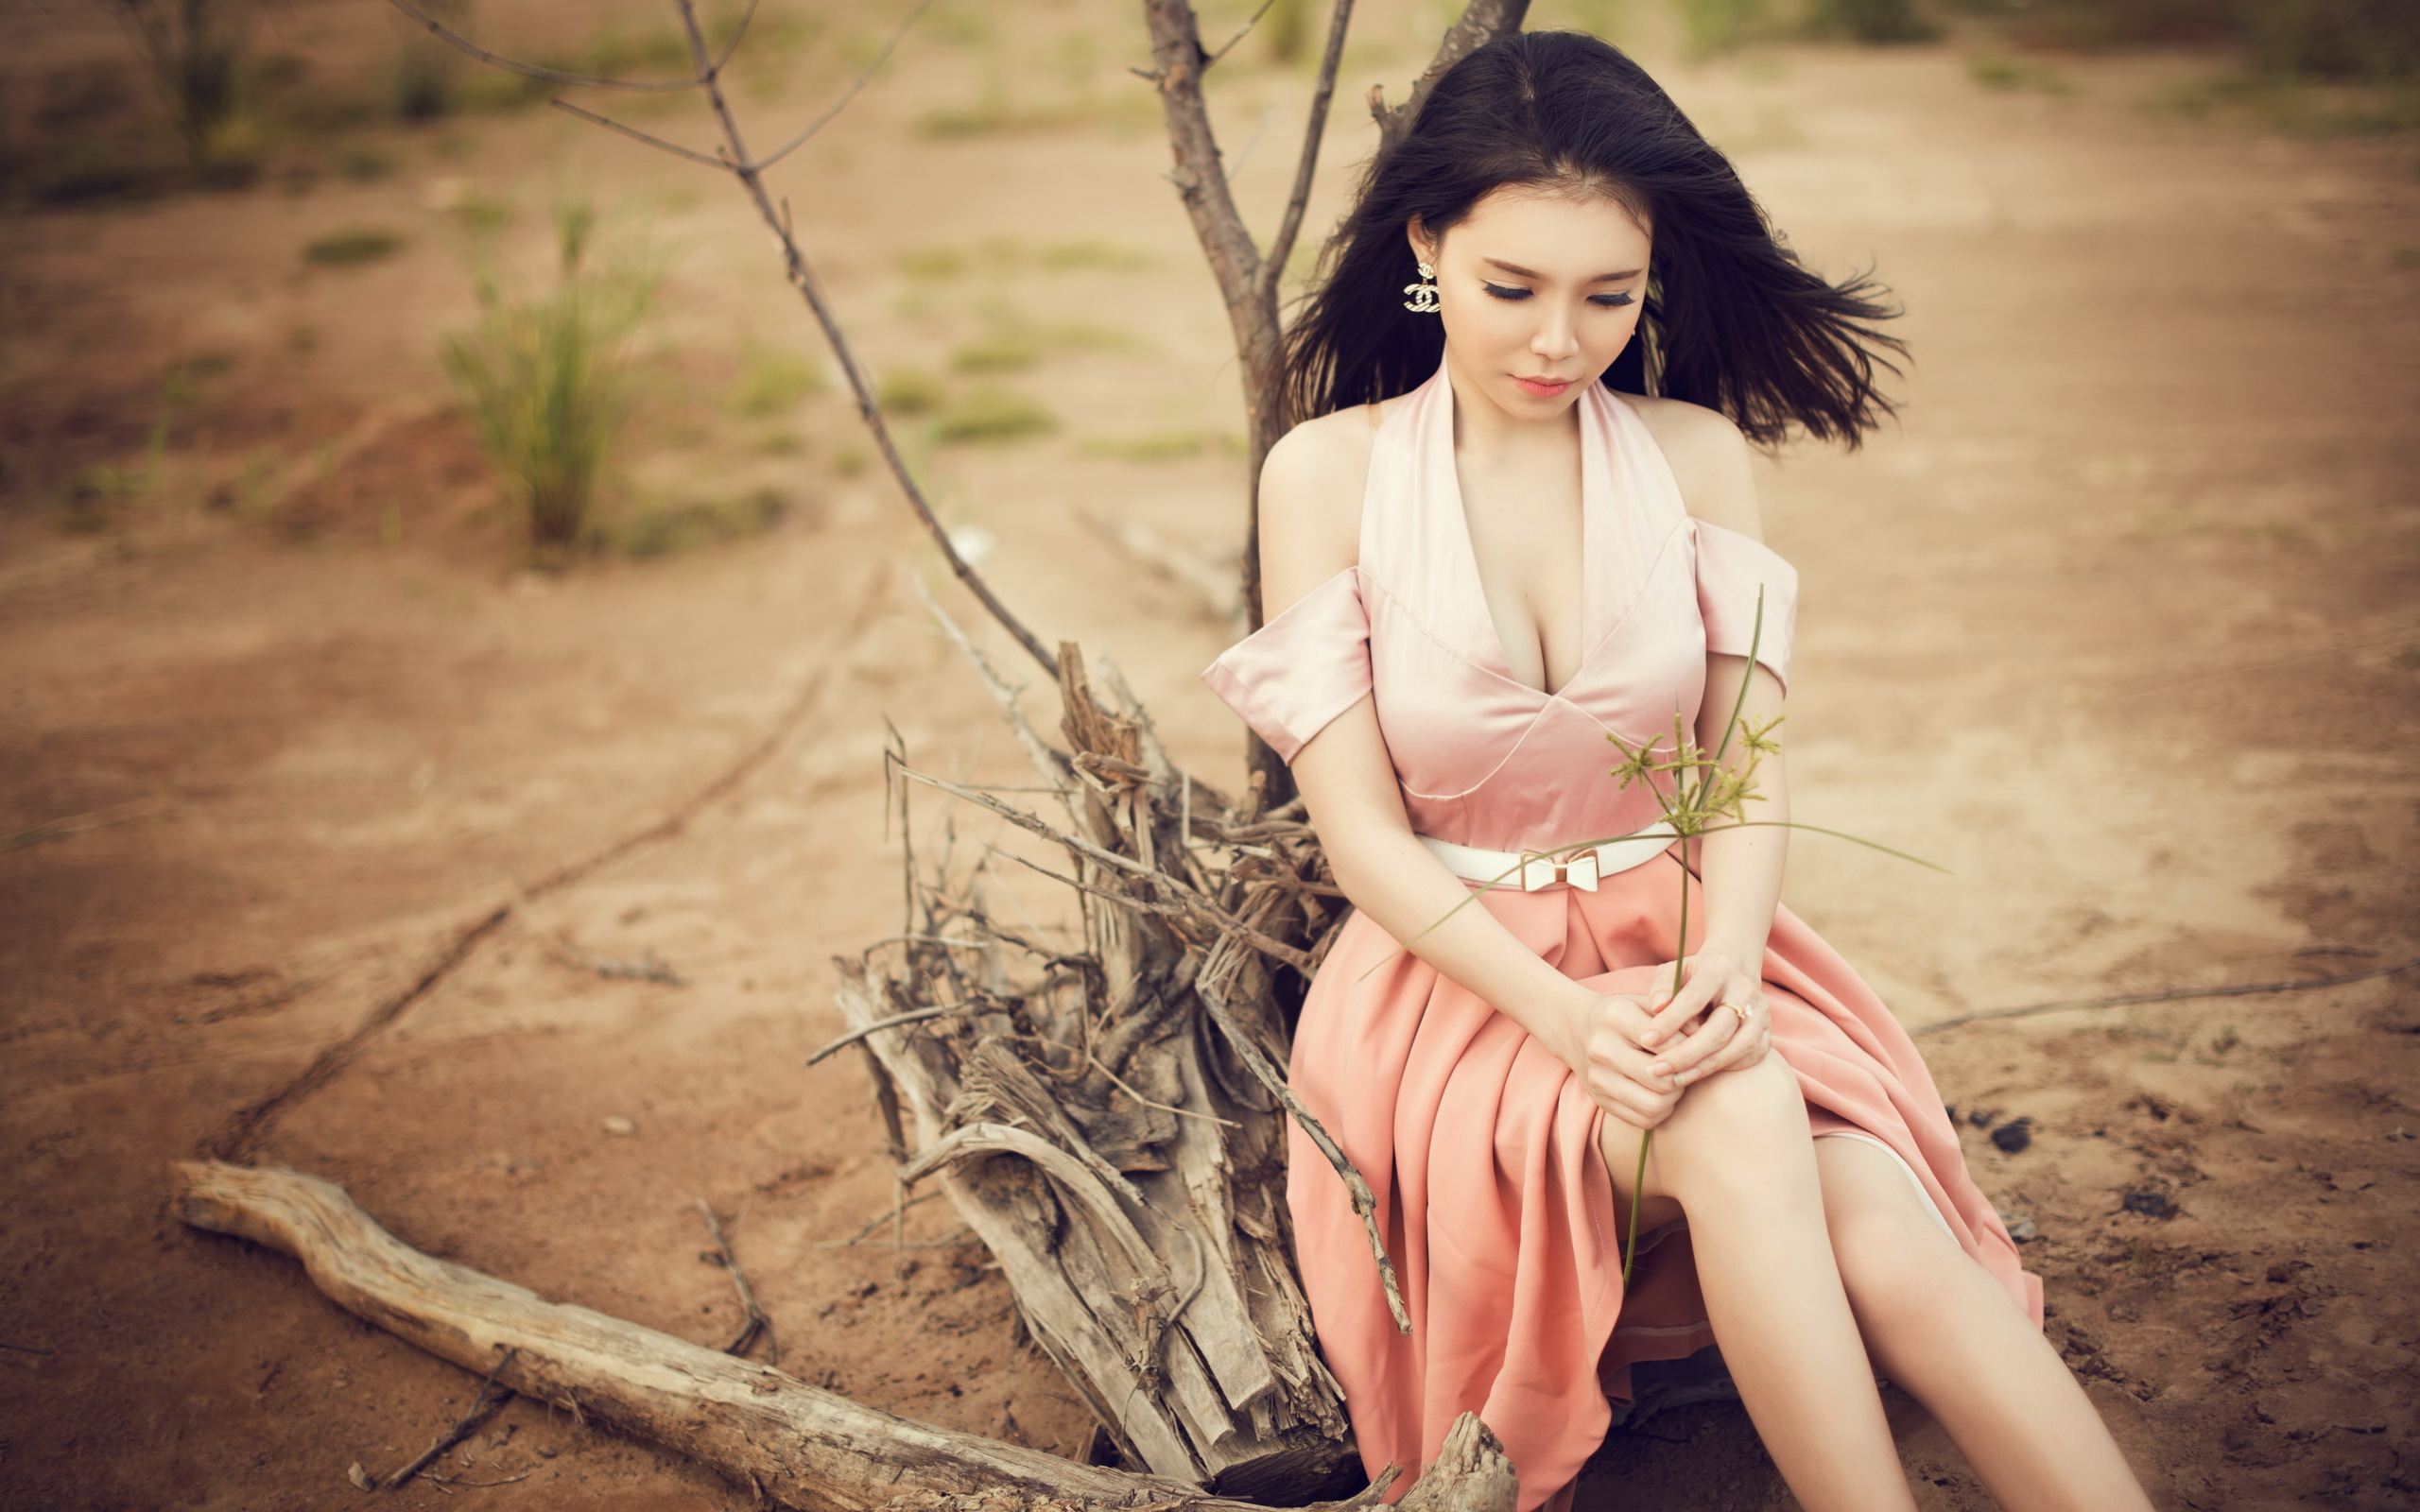 Korean Beauty Girl HD Wallpaper Stylish HD Wallpapers 2560x1600